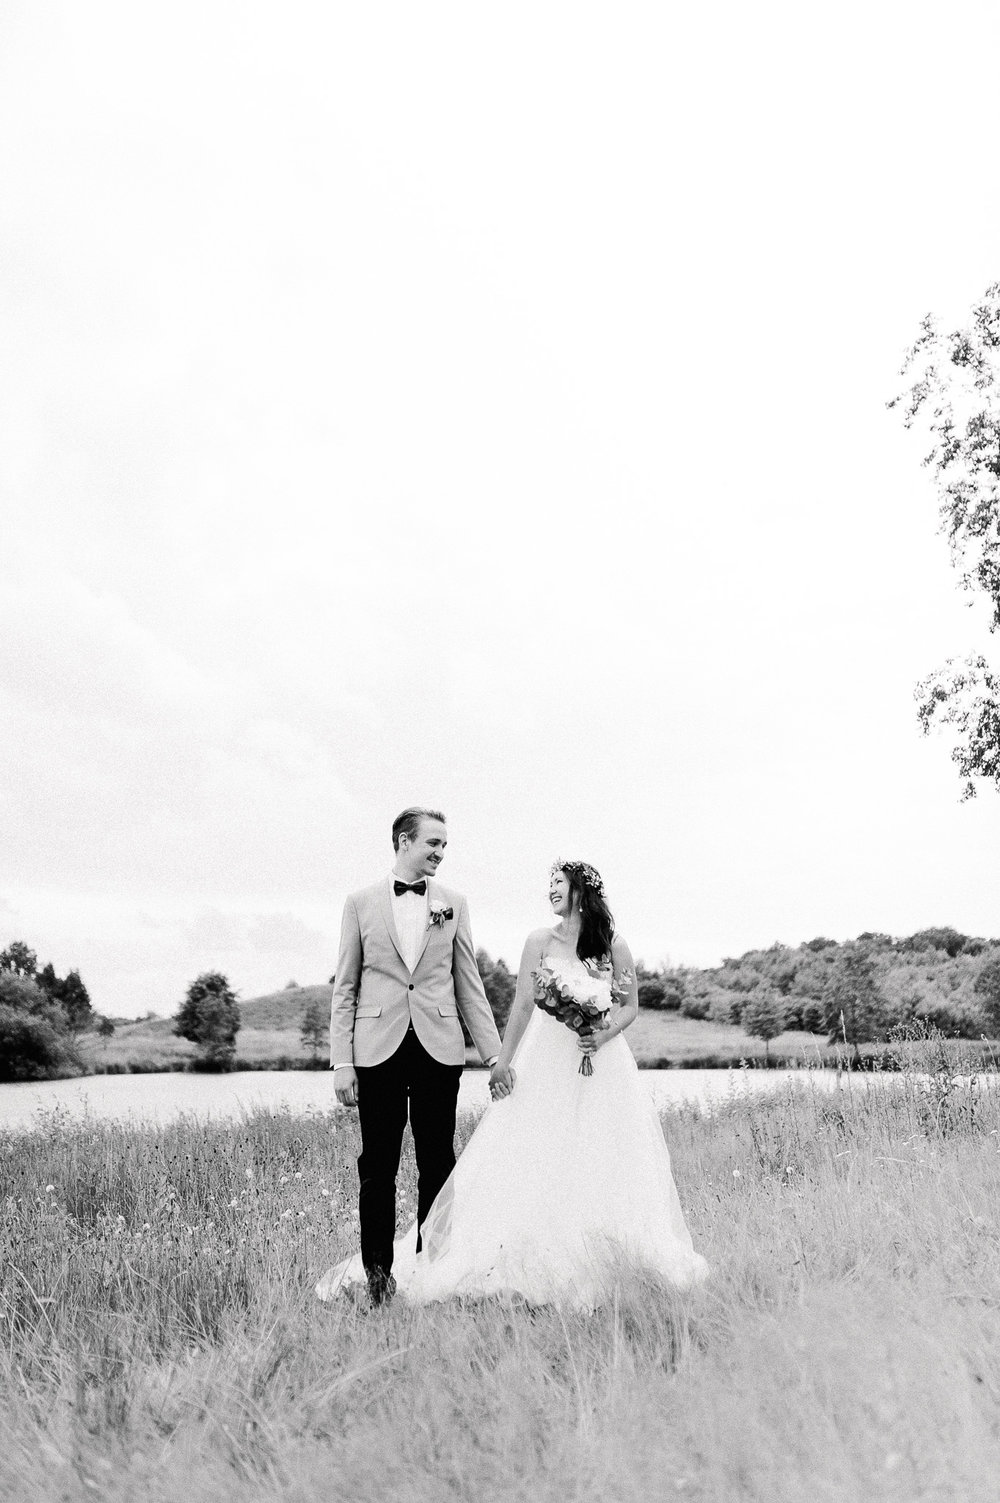 Anna_Hari_Wedding_Photography-47.jpg